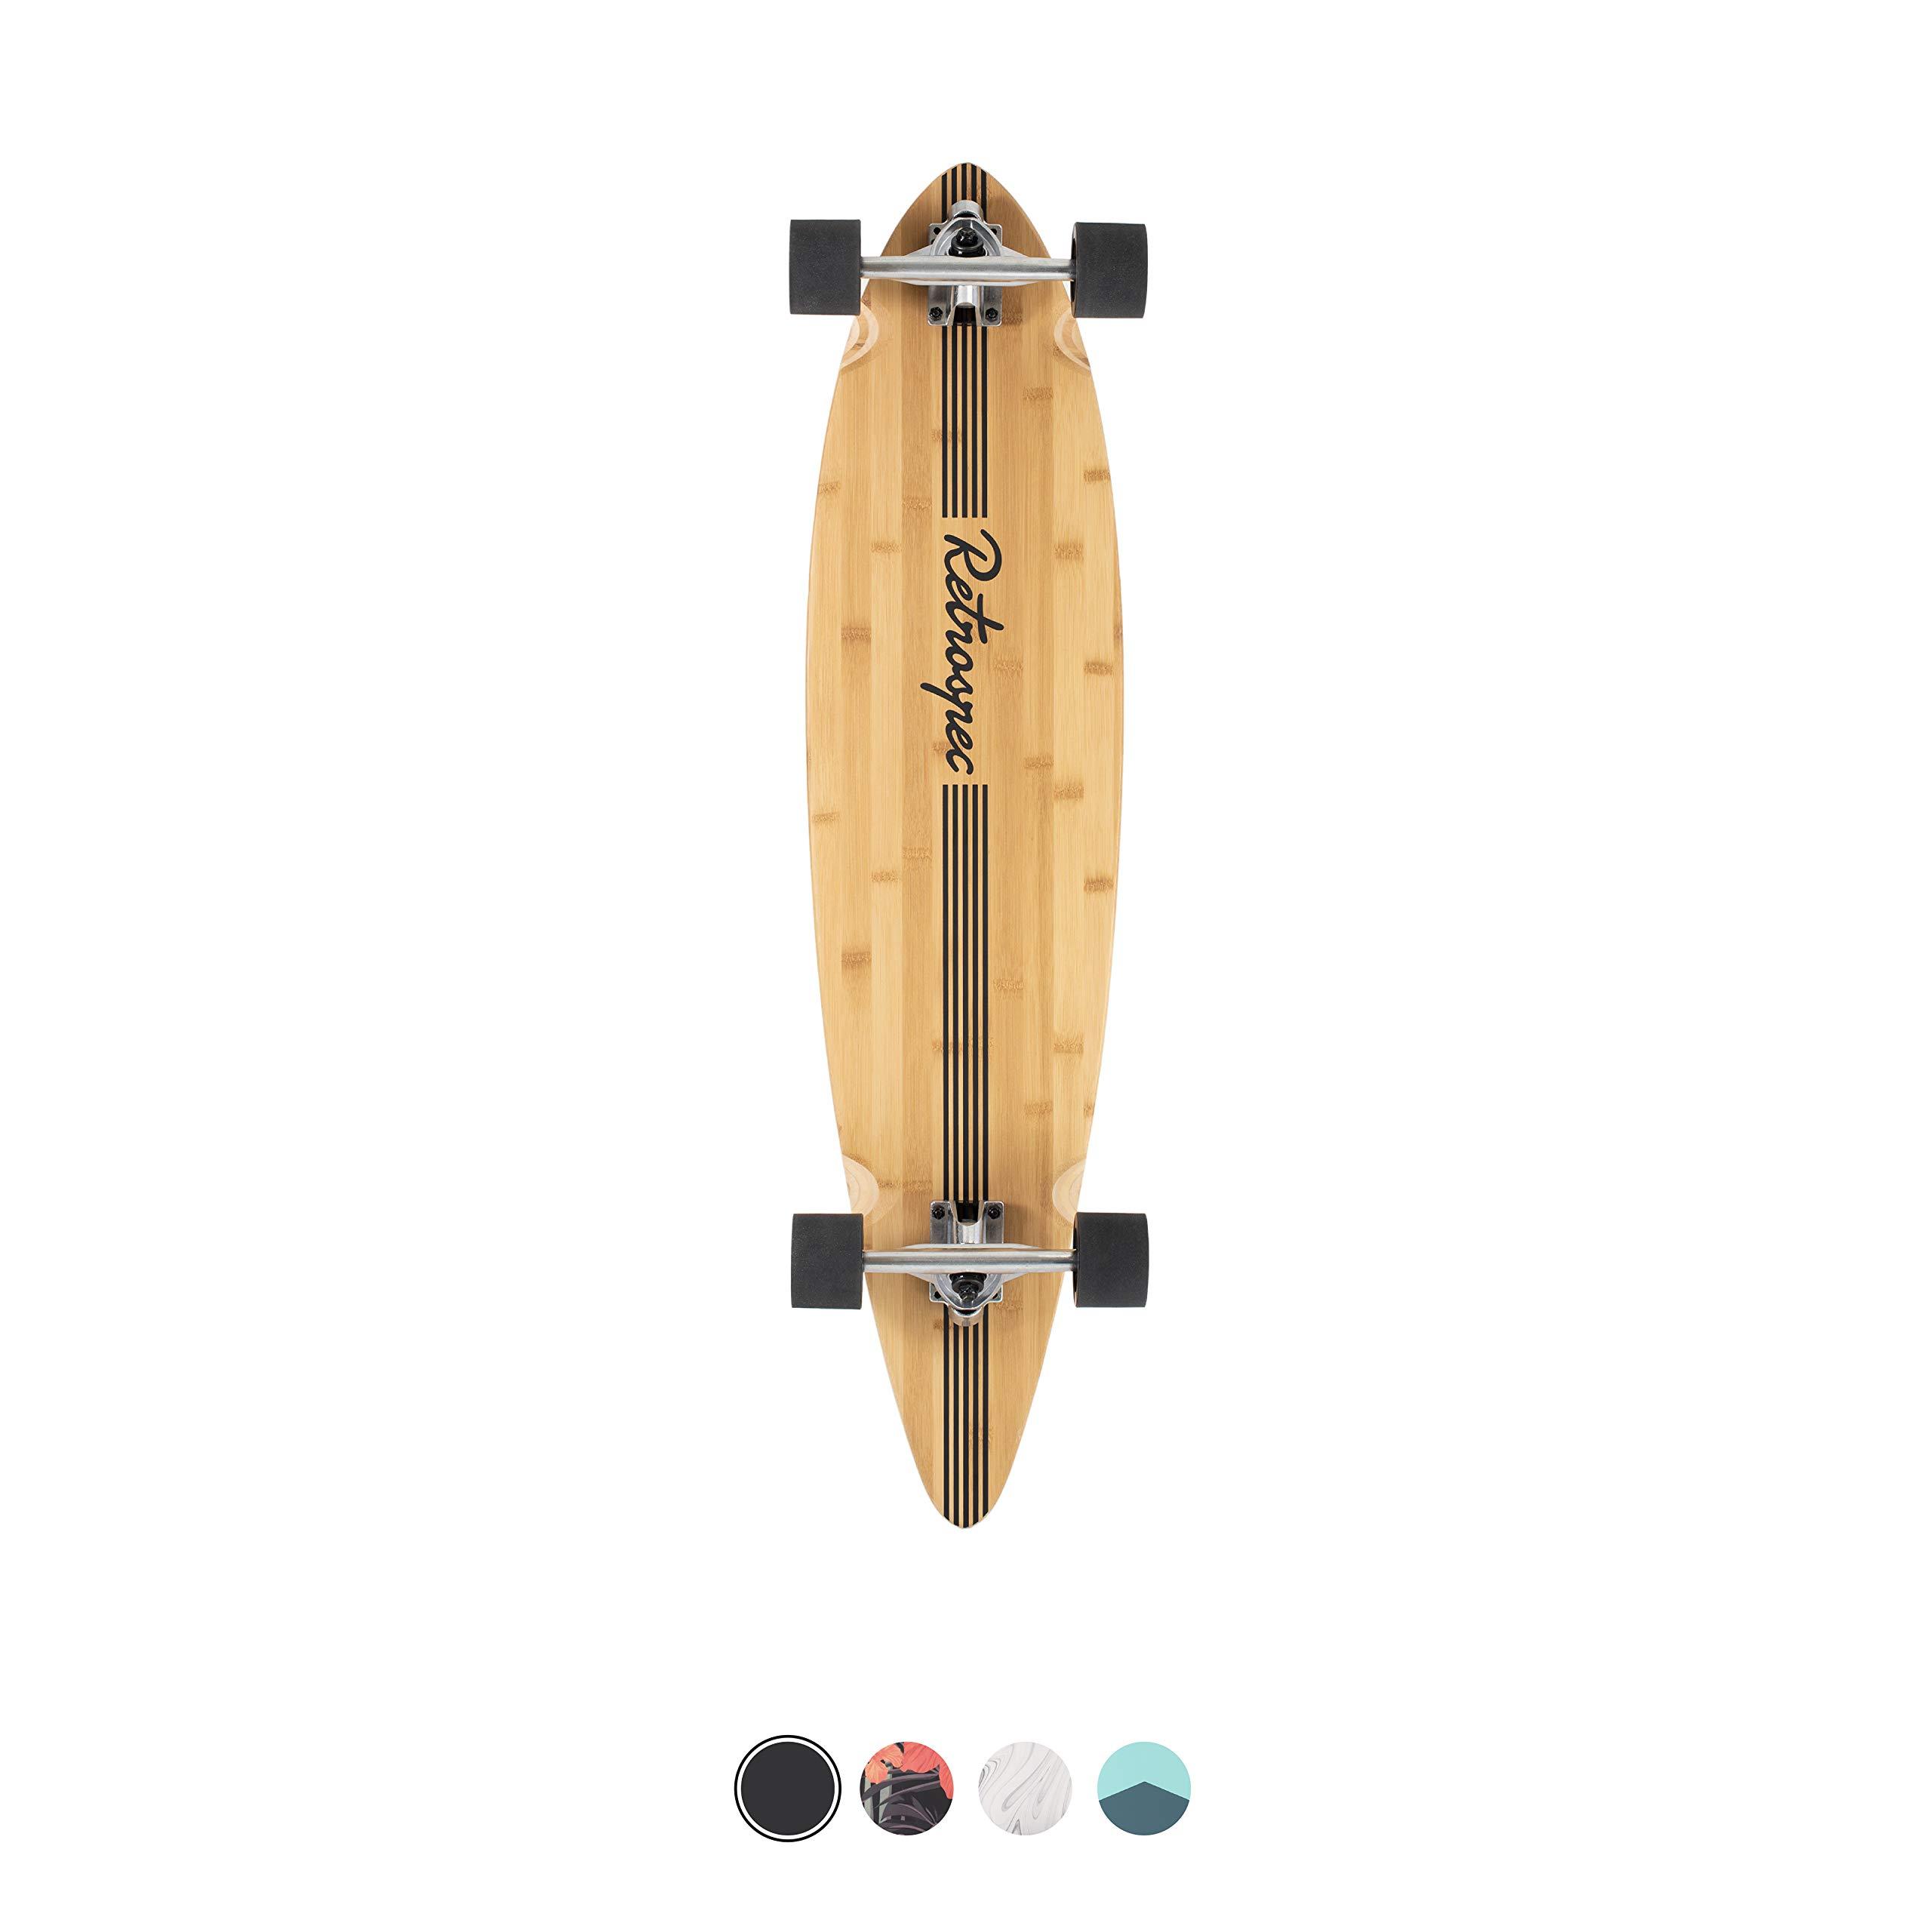 Dusters California Skateboards R 9.125 x 38 Williams CA Locos Buffons Cobalt Longboard Complete Skateboard